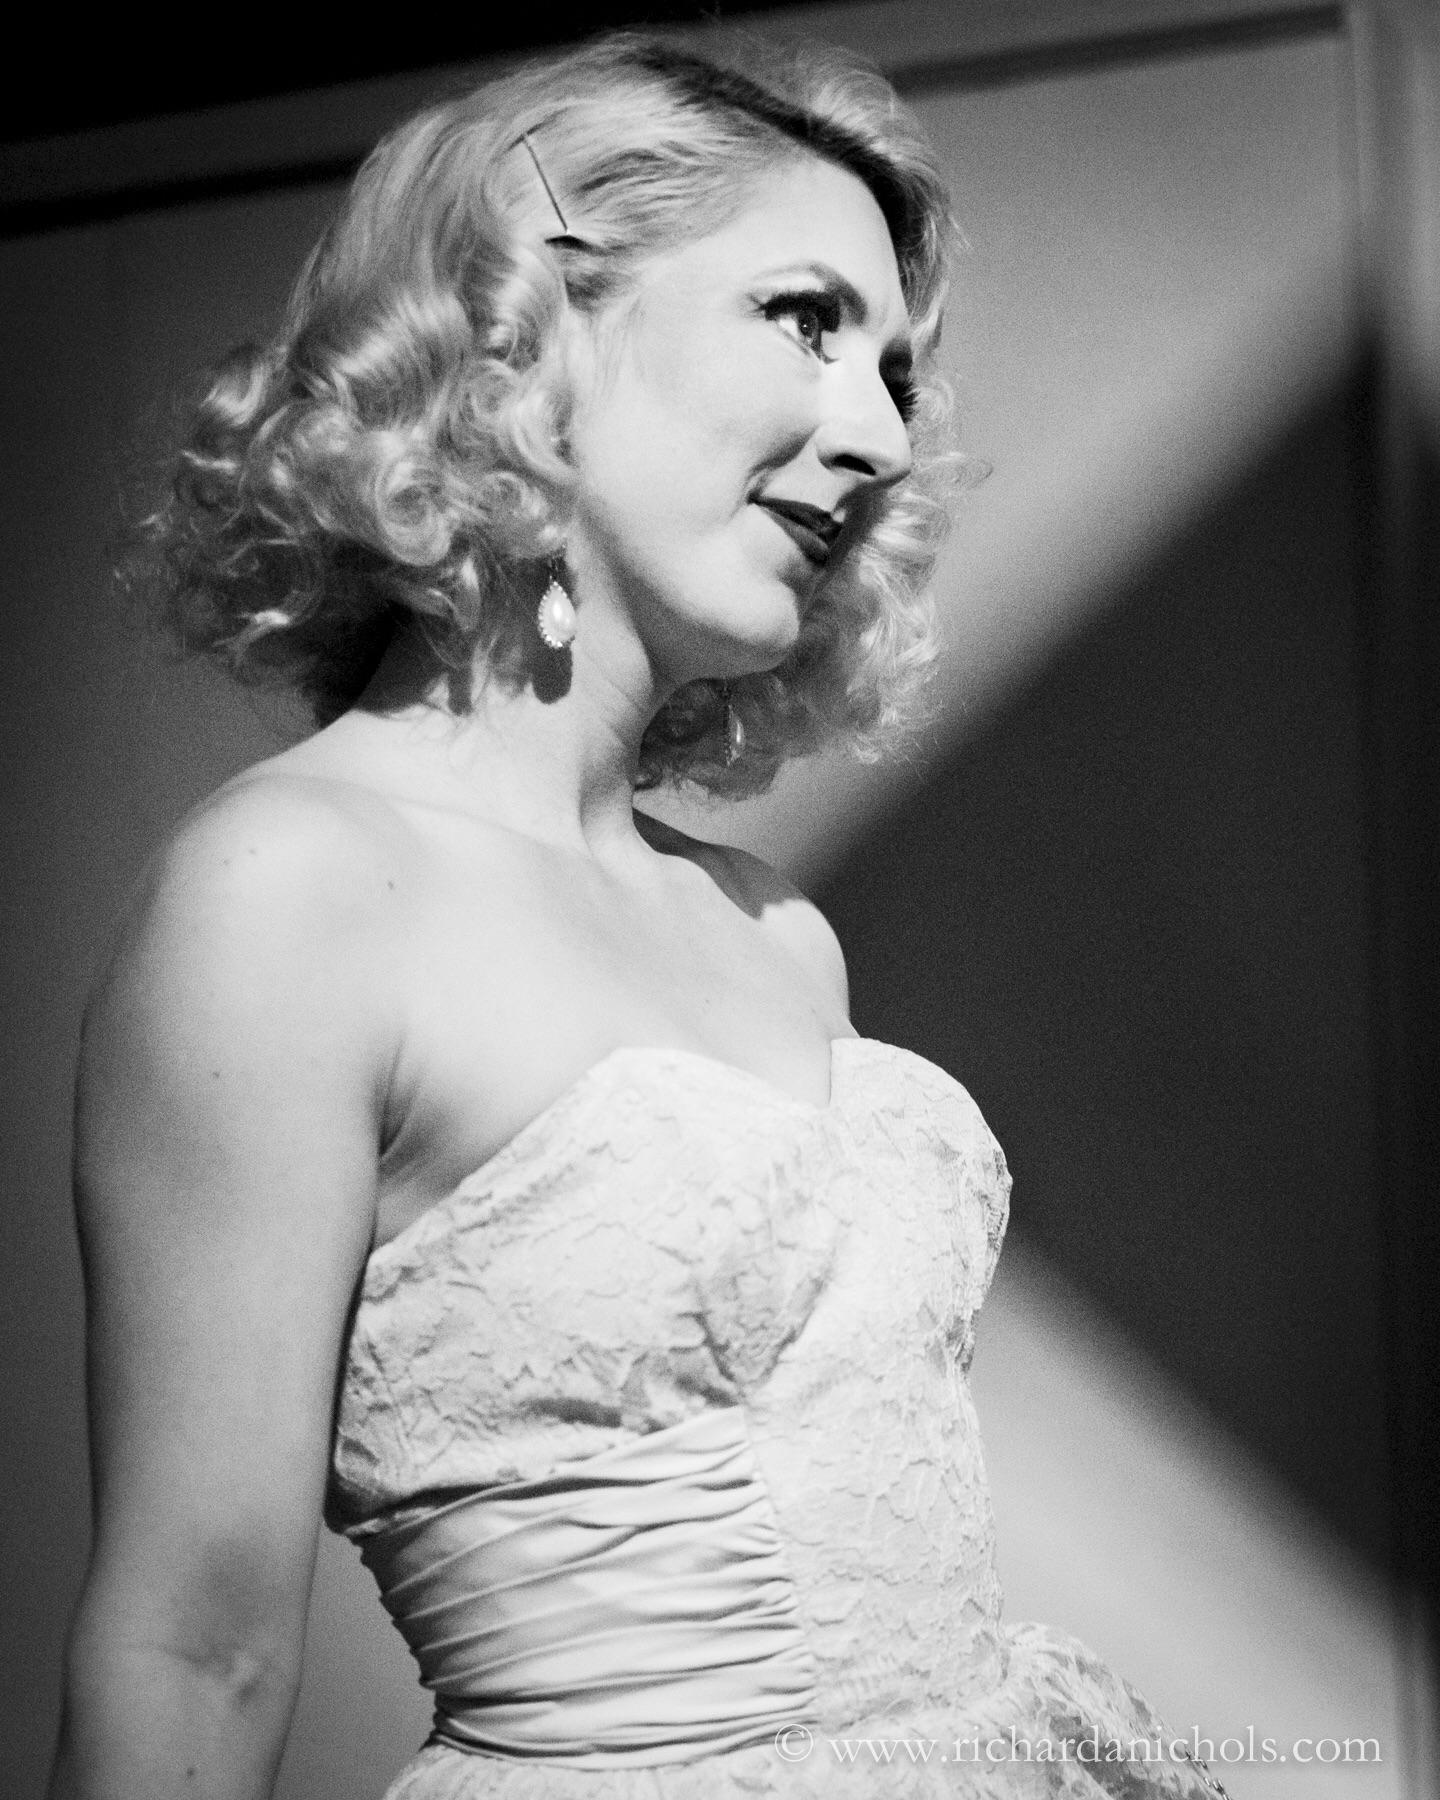 Lola Van Ella waiting to go on stage at Jazz at the Bistro